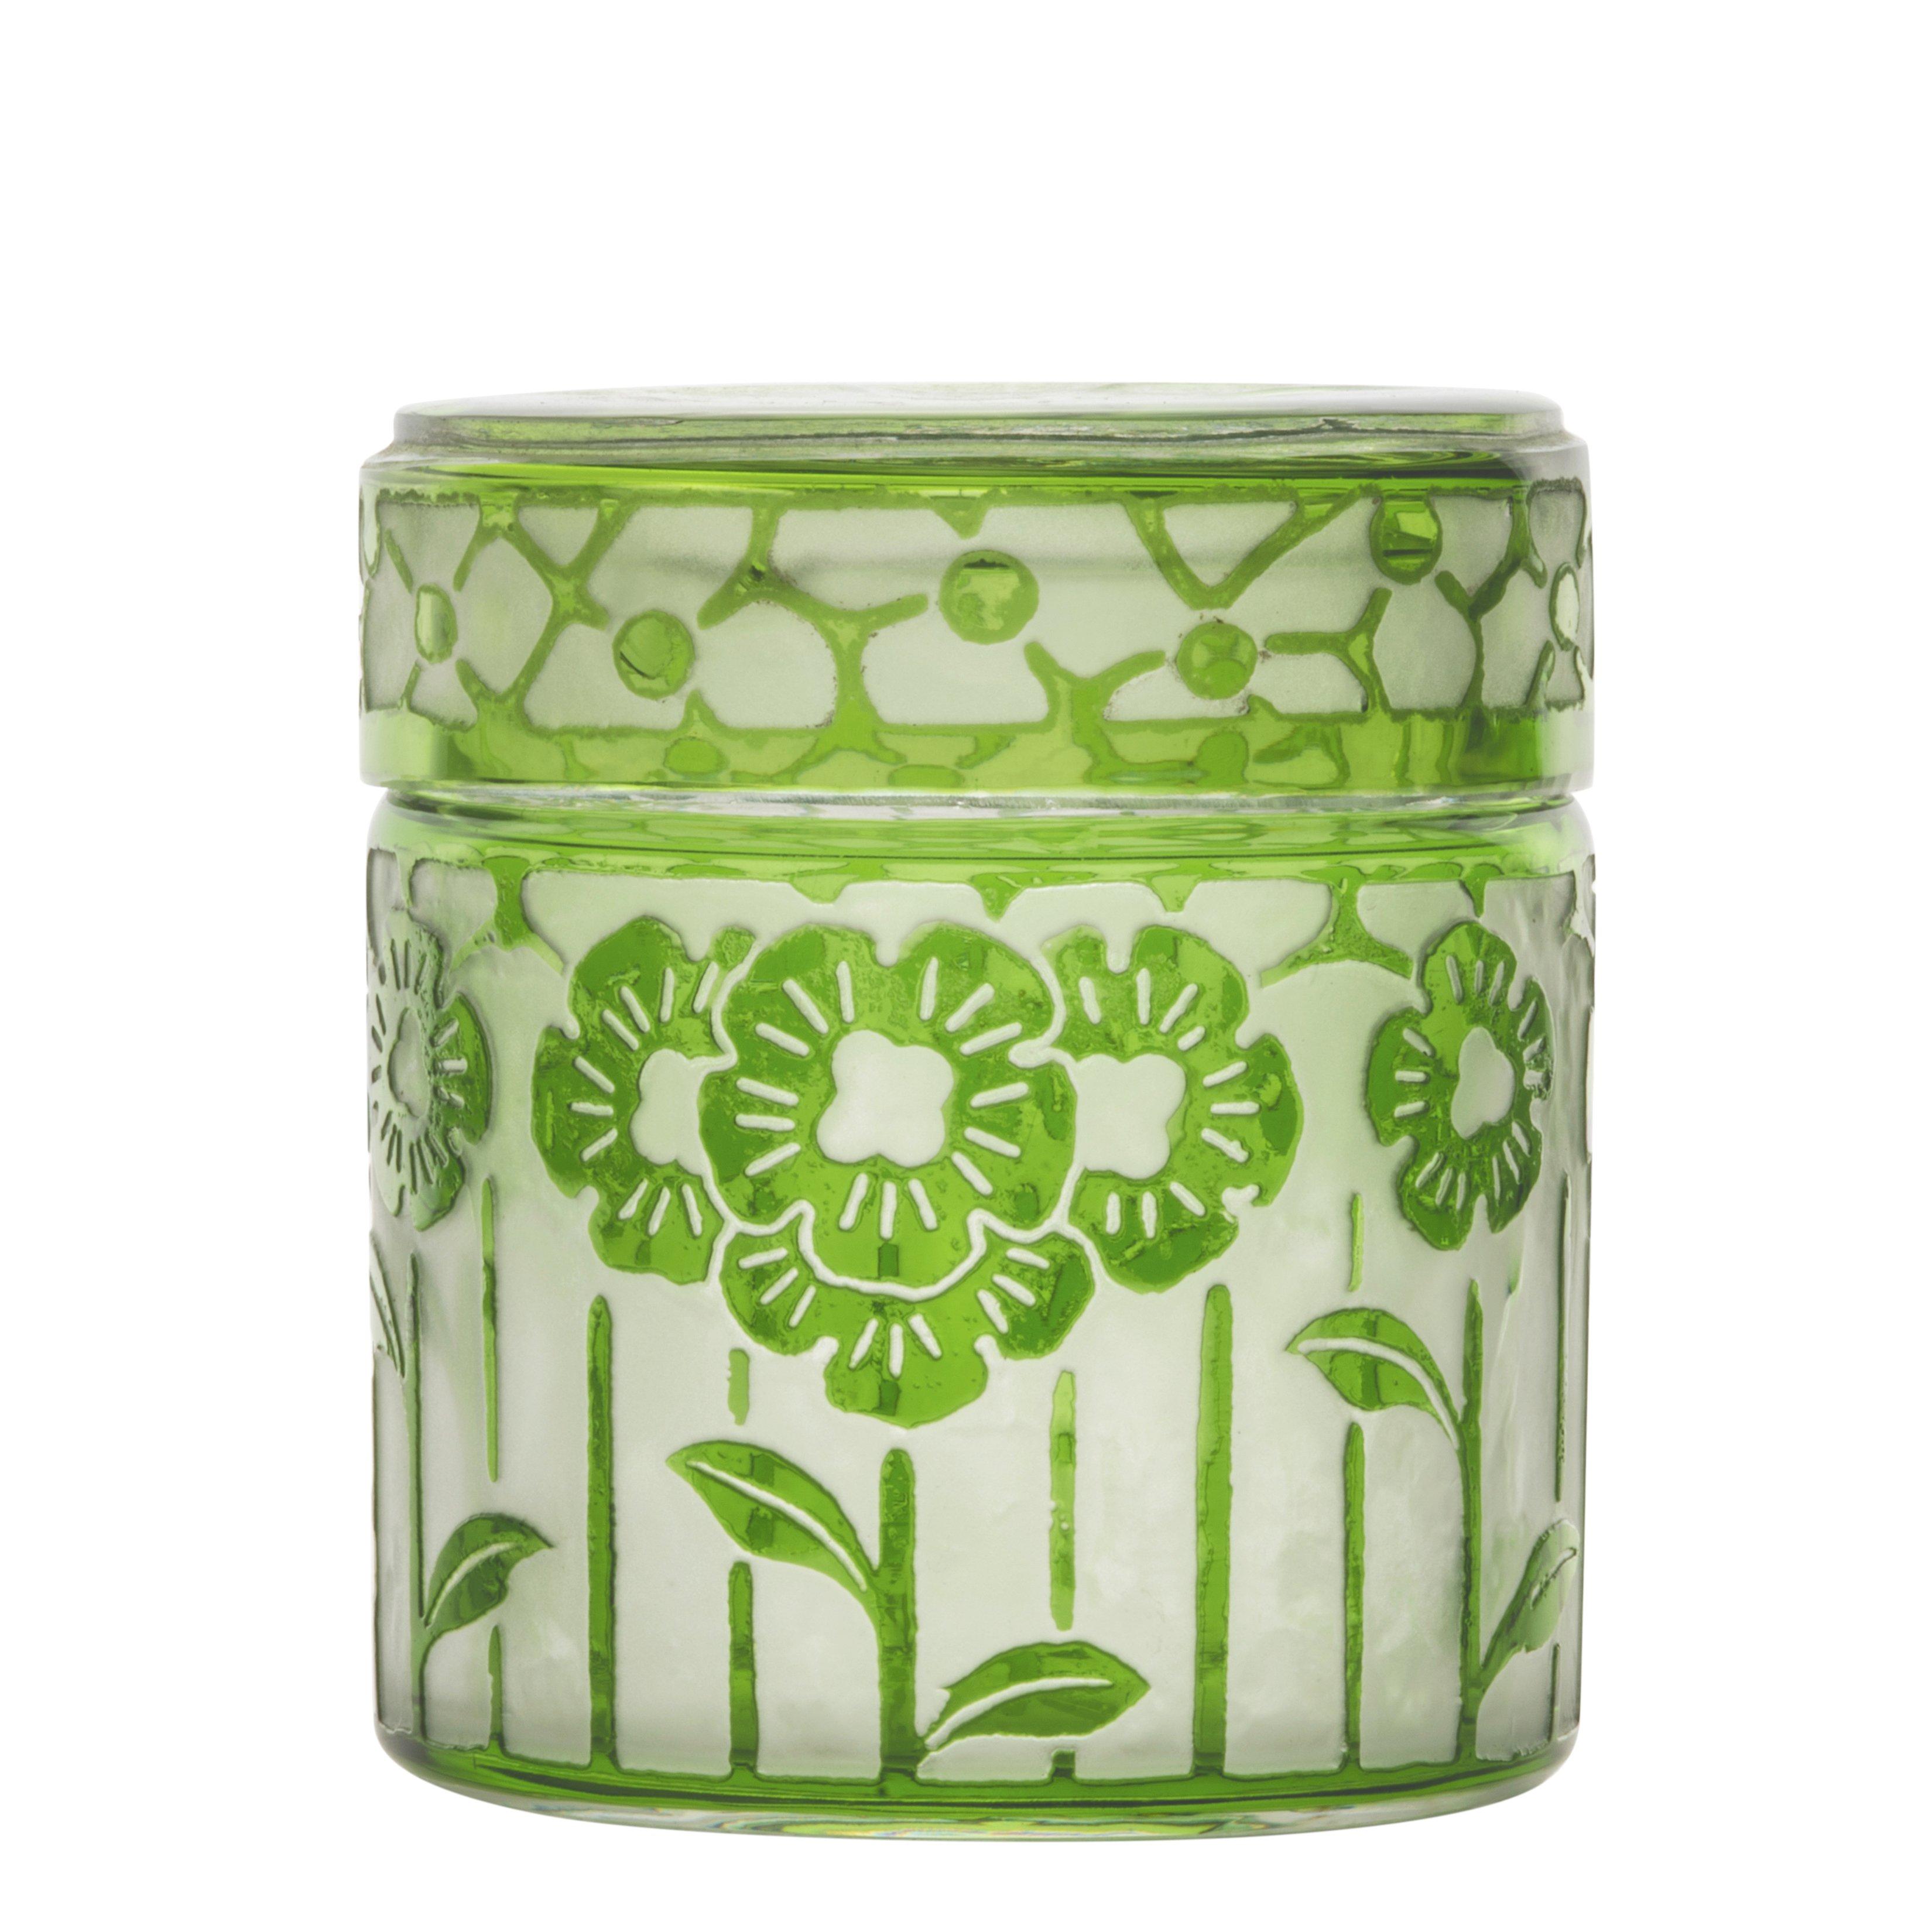 An Antique French Green Acid Etched Powder Jar Signed Cristalleries De Nancy